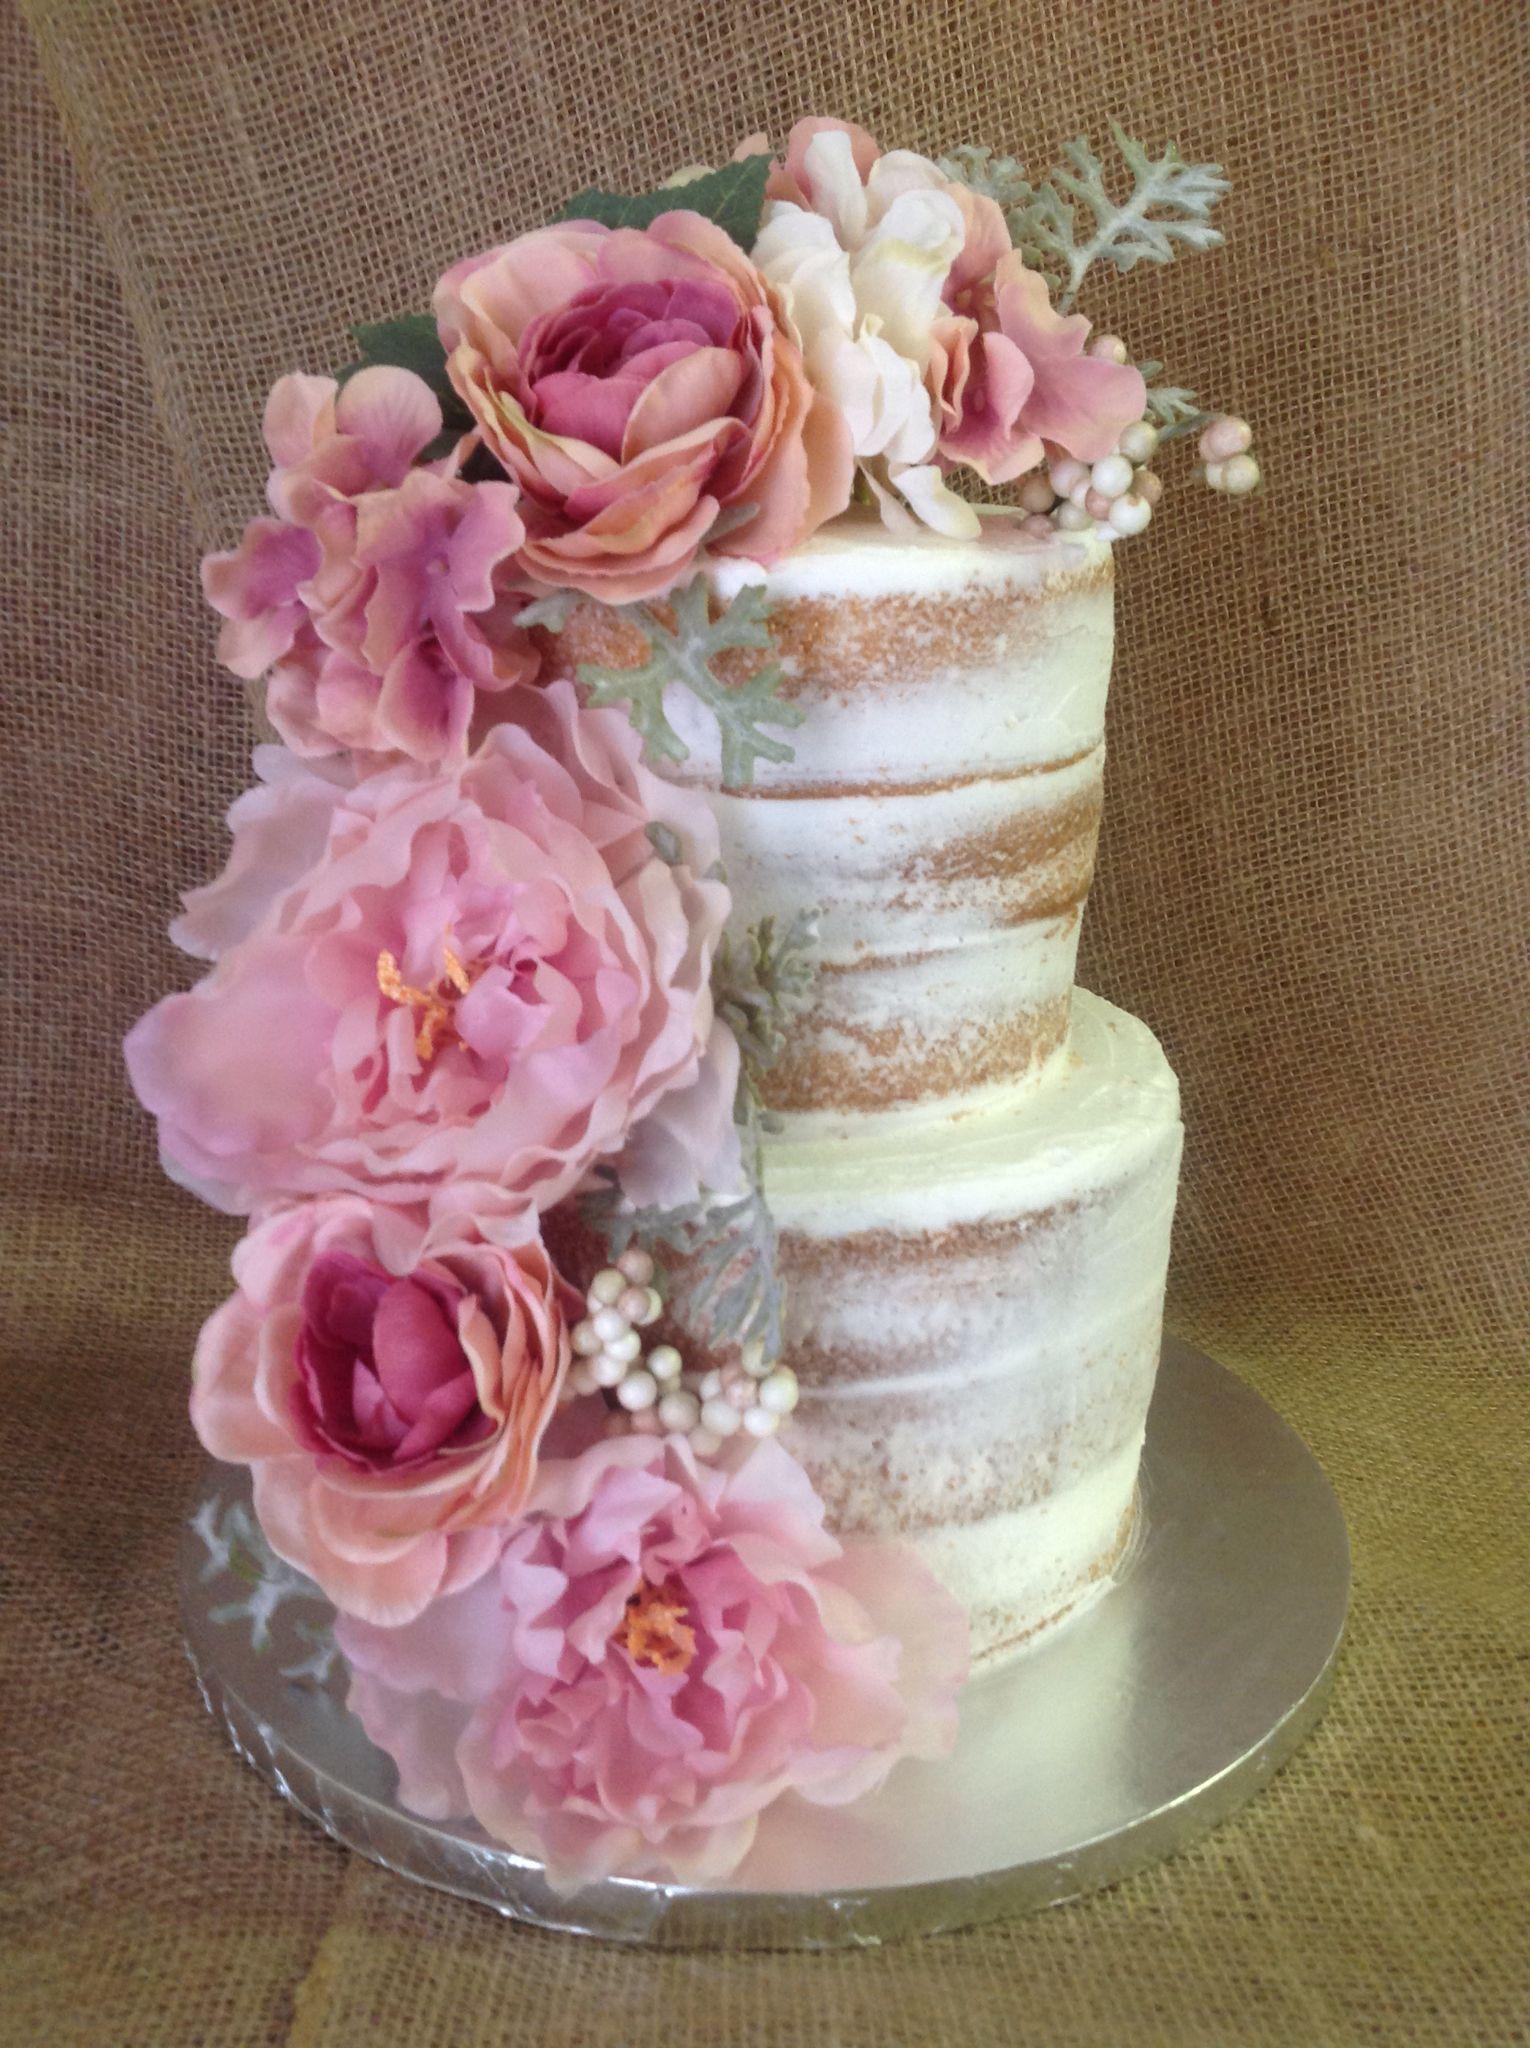 Torte nuziali naked cake Pagina 13 - Fotogallery Donnaclick